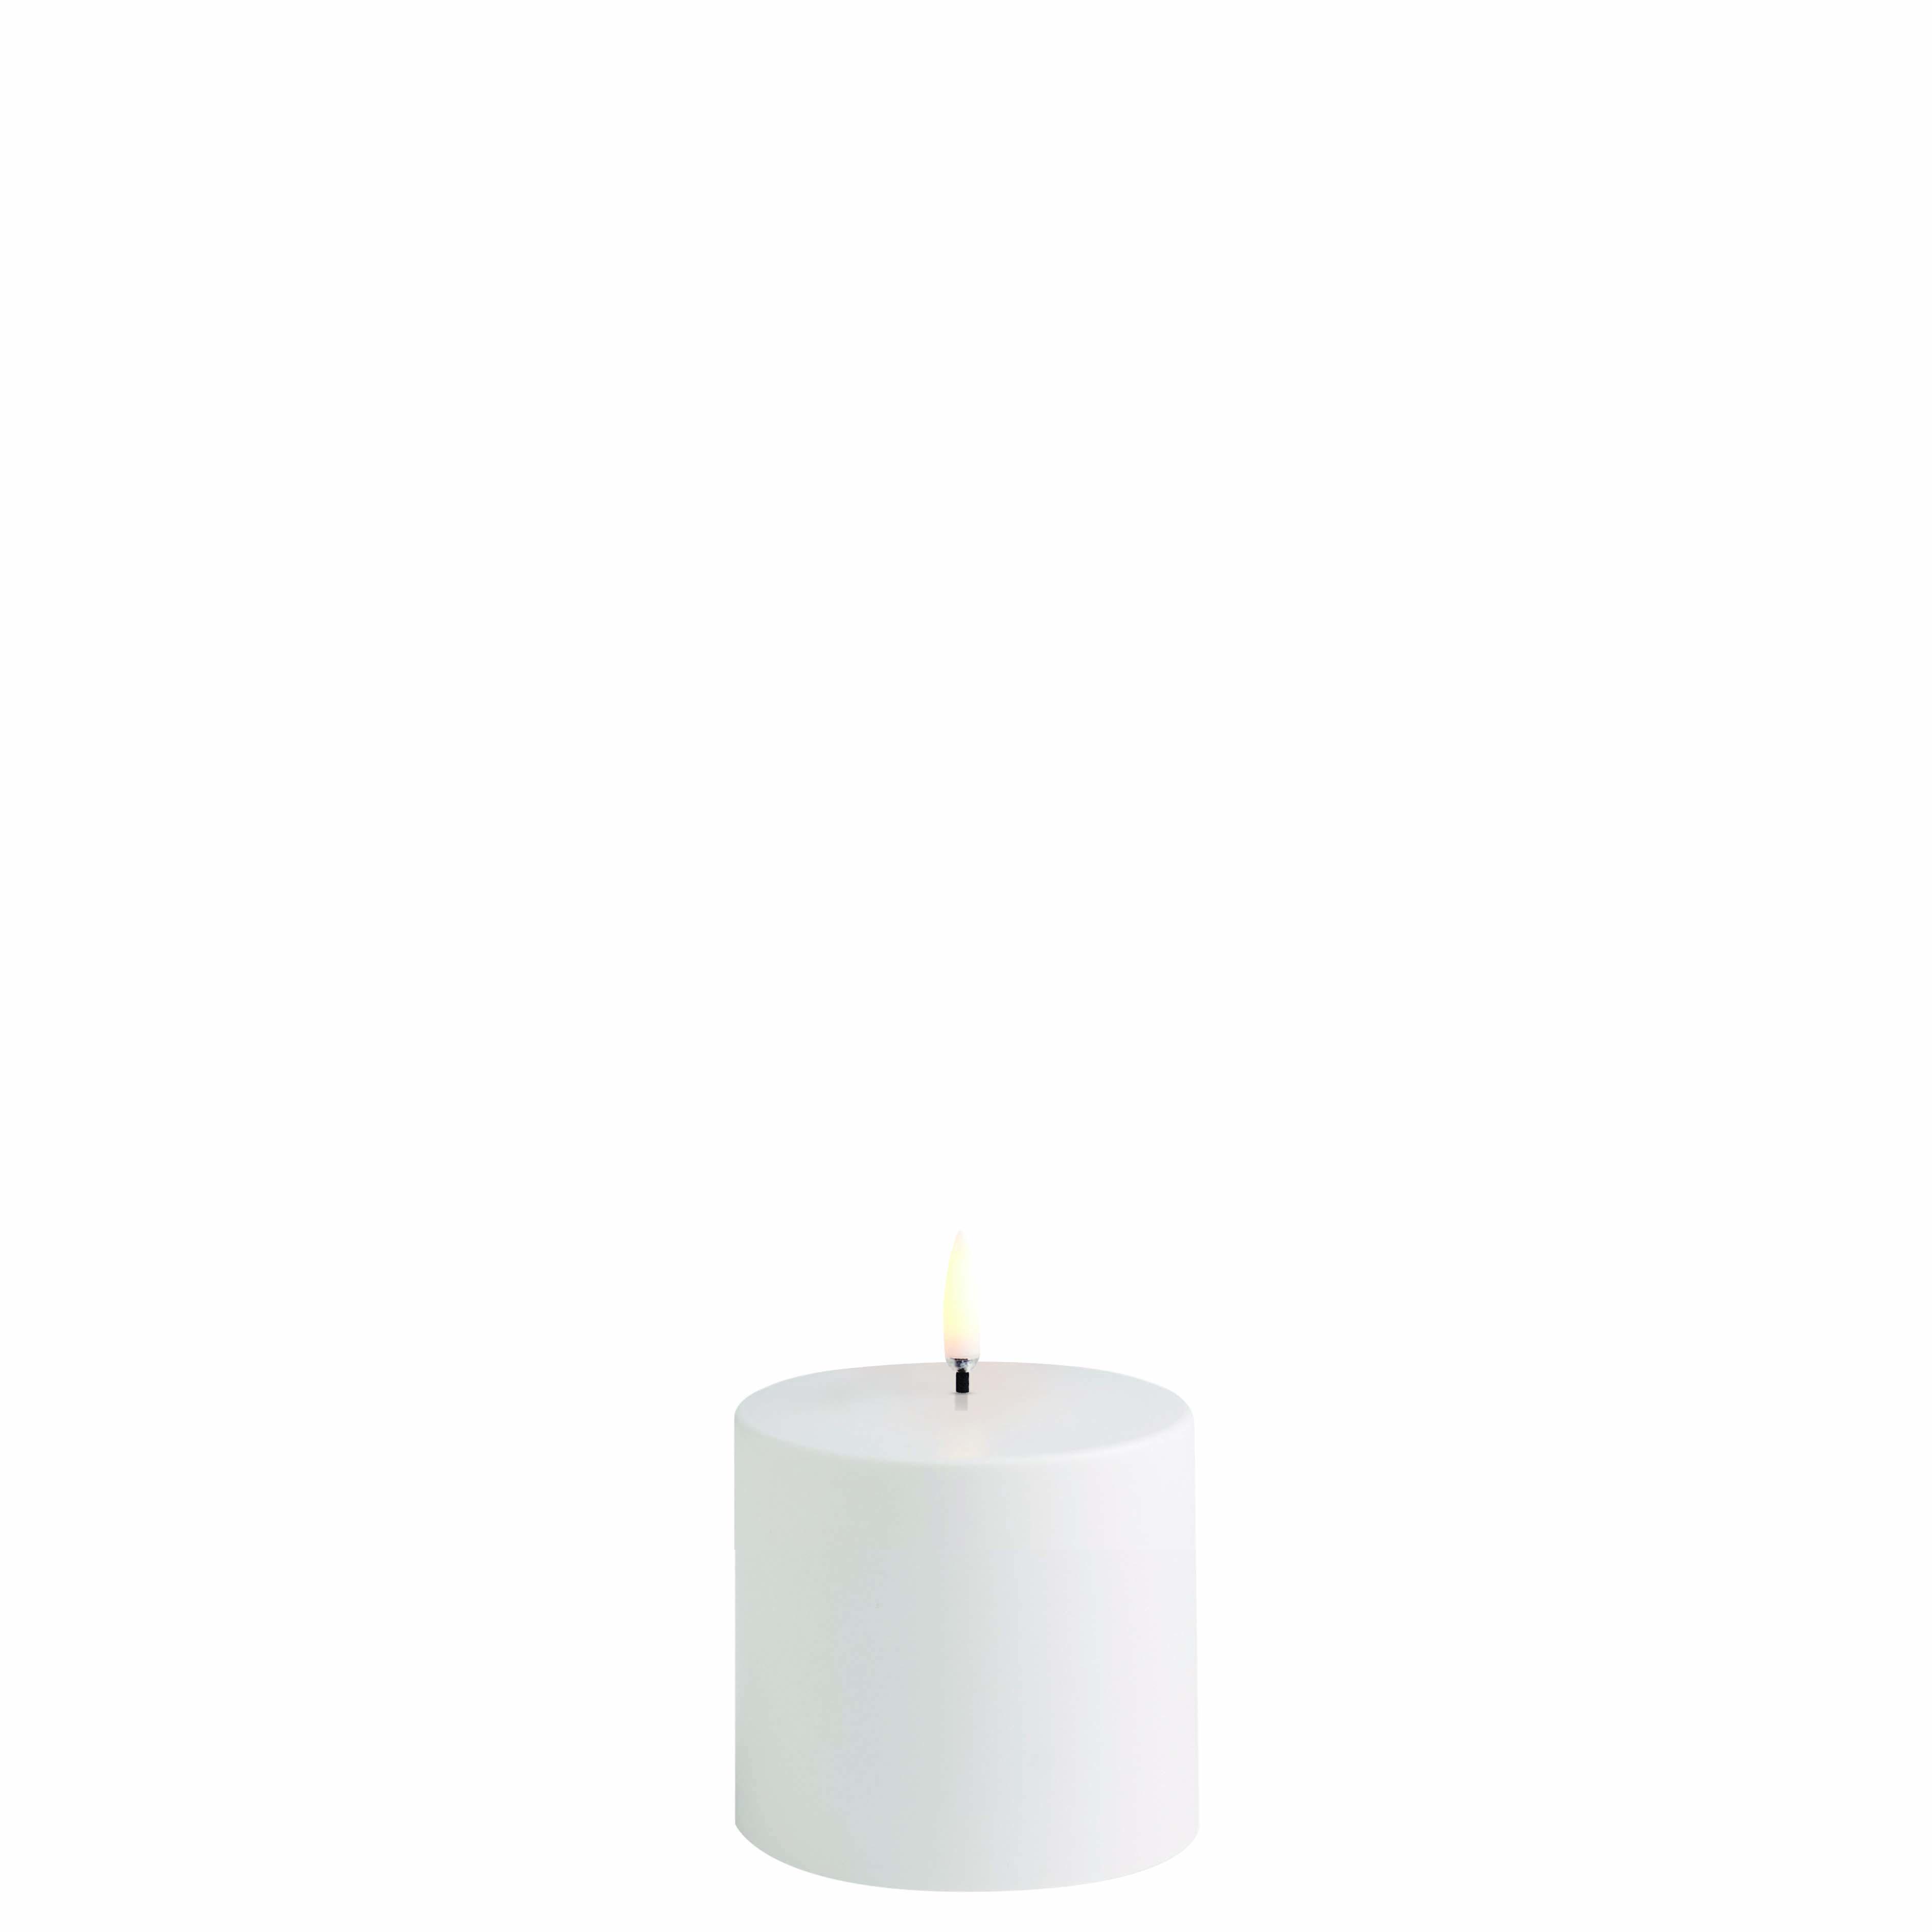 Uyuni LED udendørslys, 7,8x7,8 cm, hvid